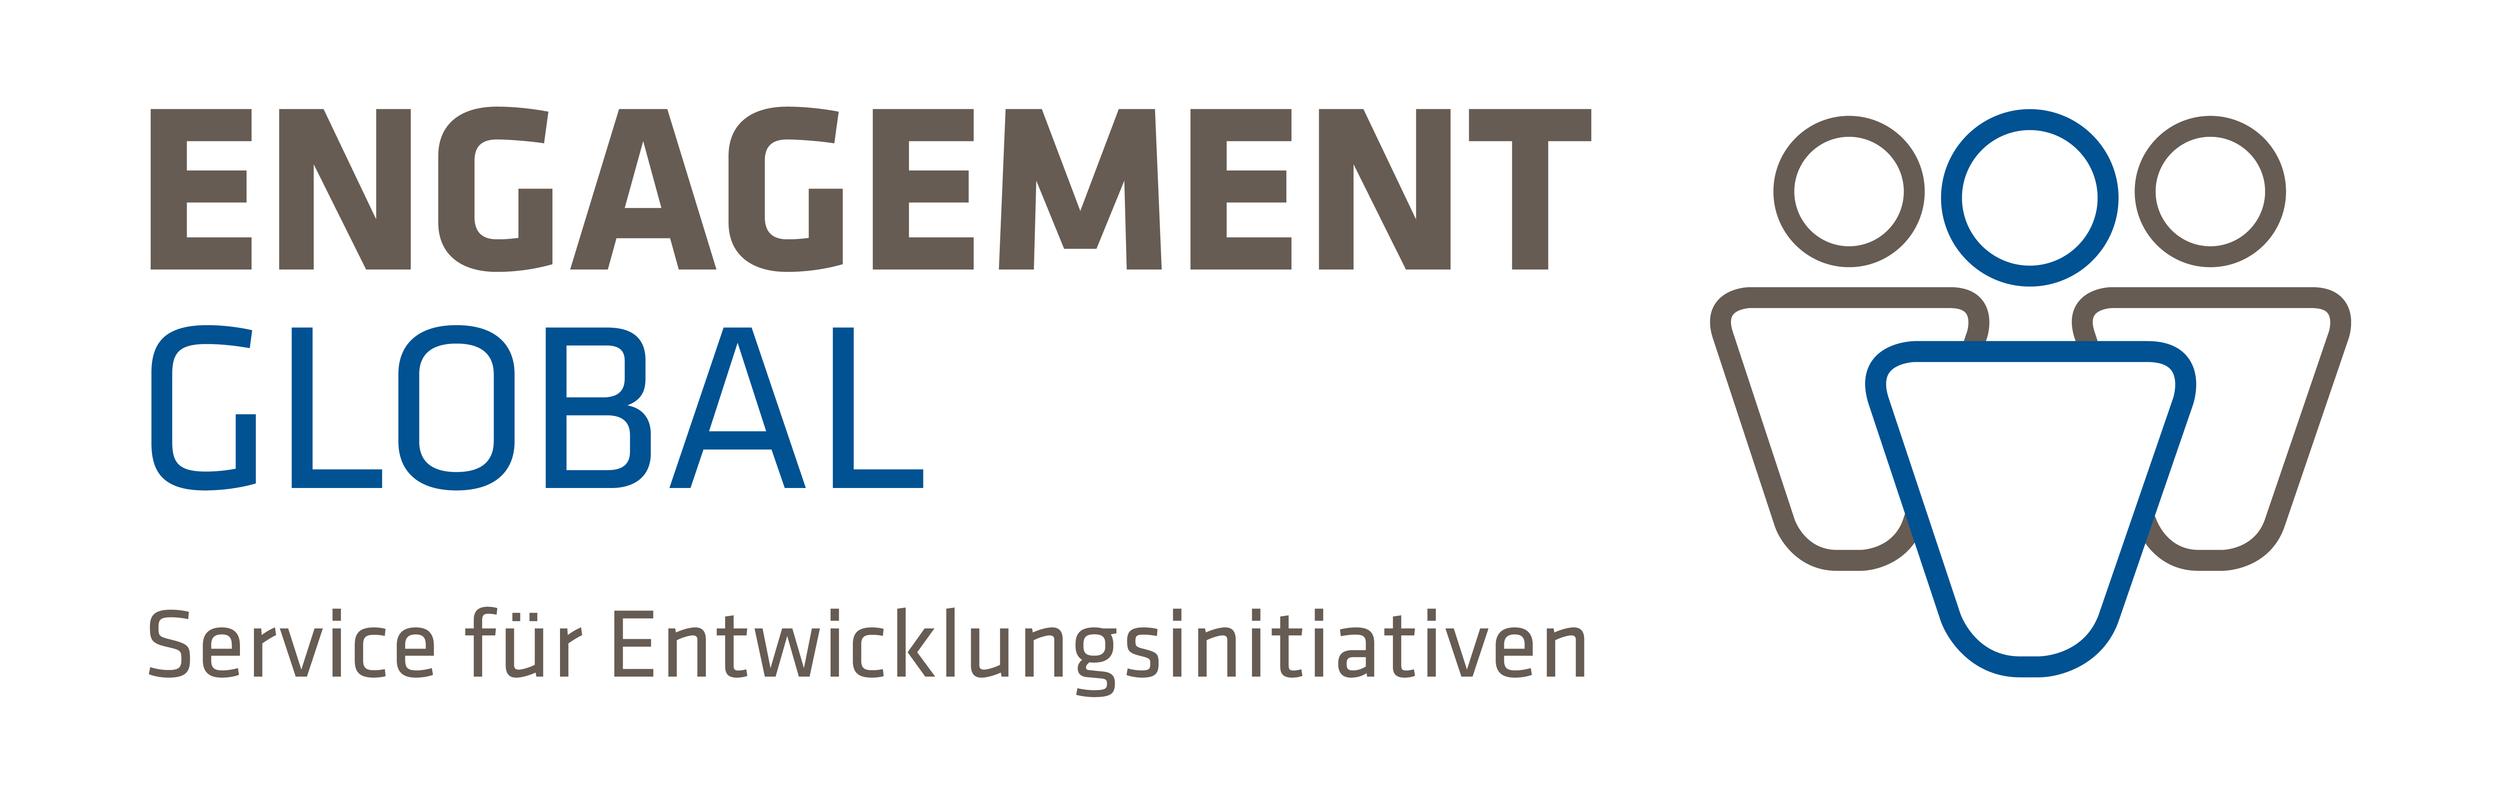 Logo-engagement global.png